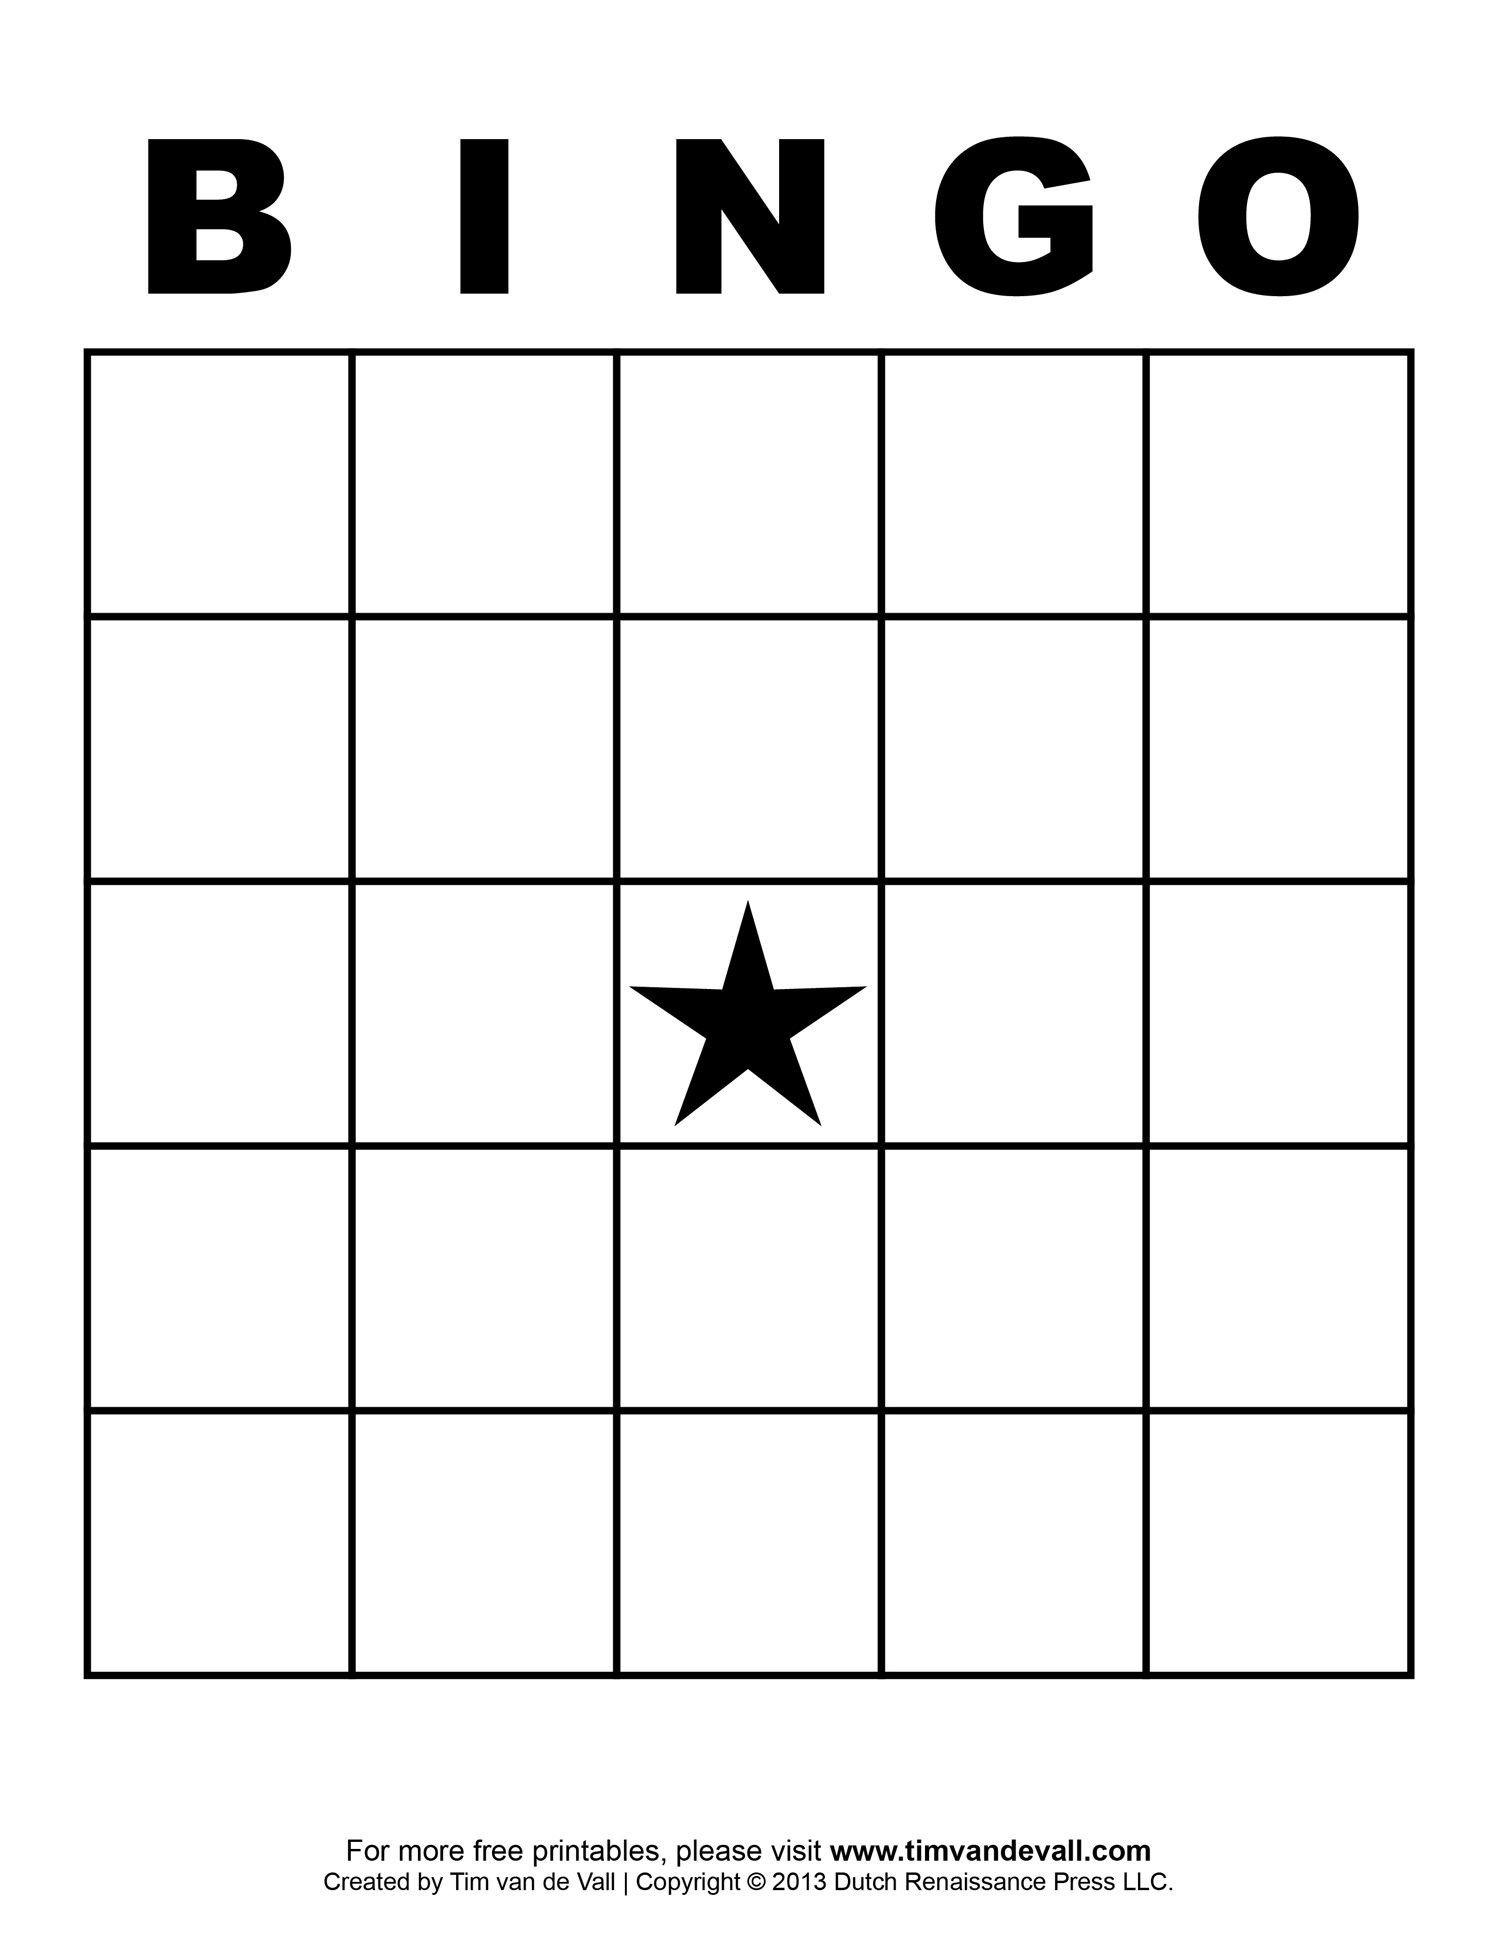 Spelling Bingo Board Free Printable Blank Bingo Cards Template 4 X 4